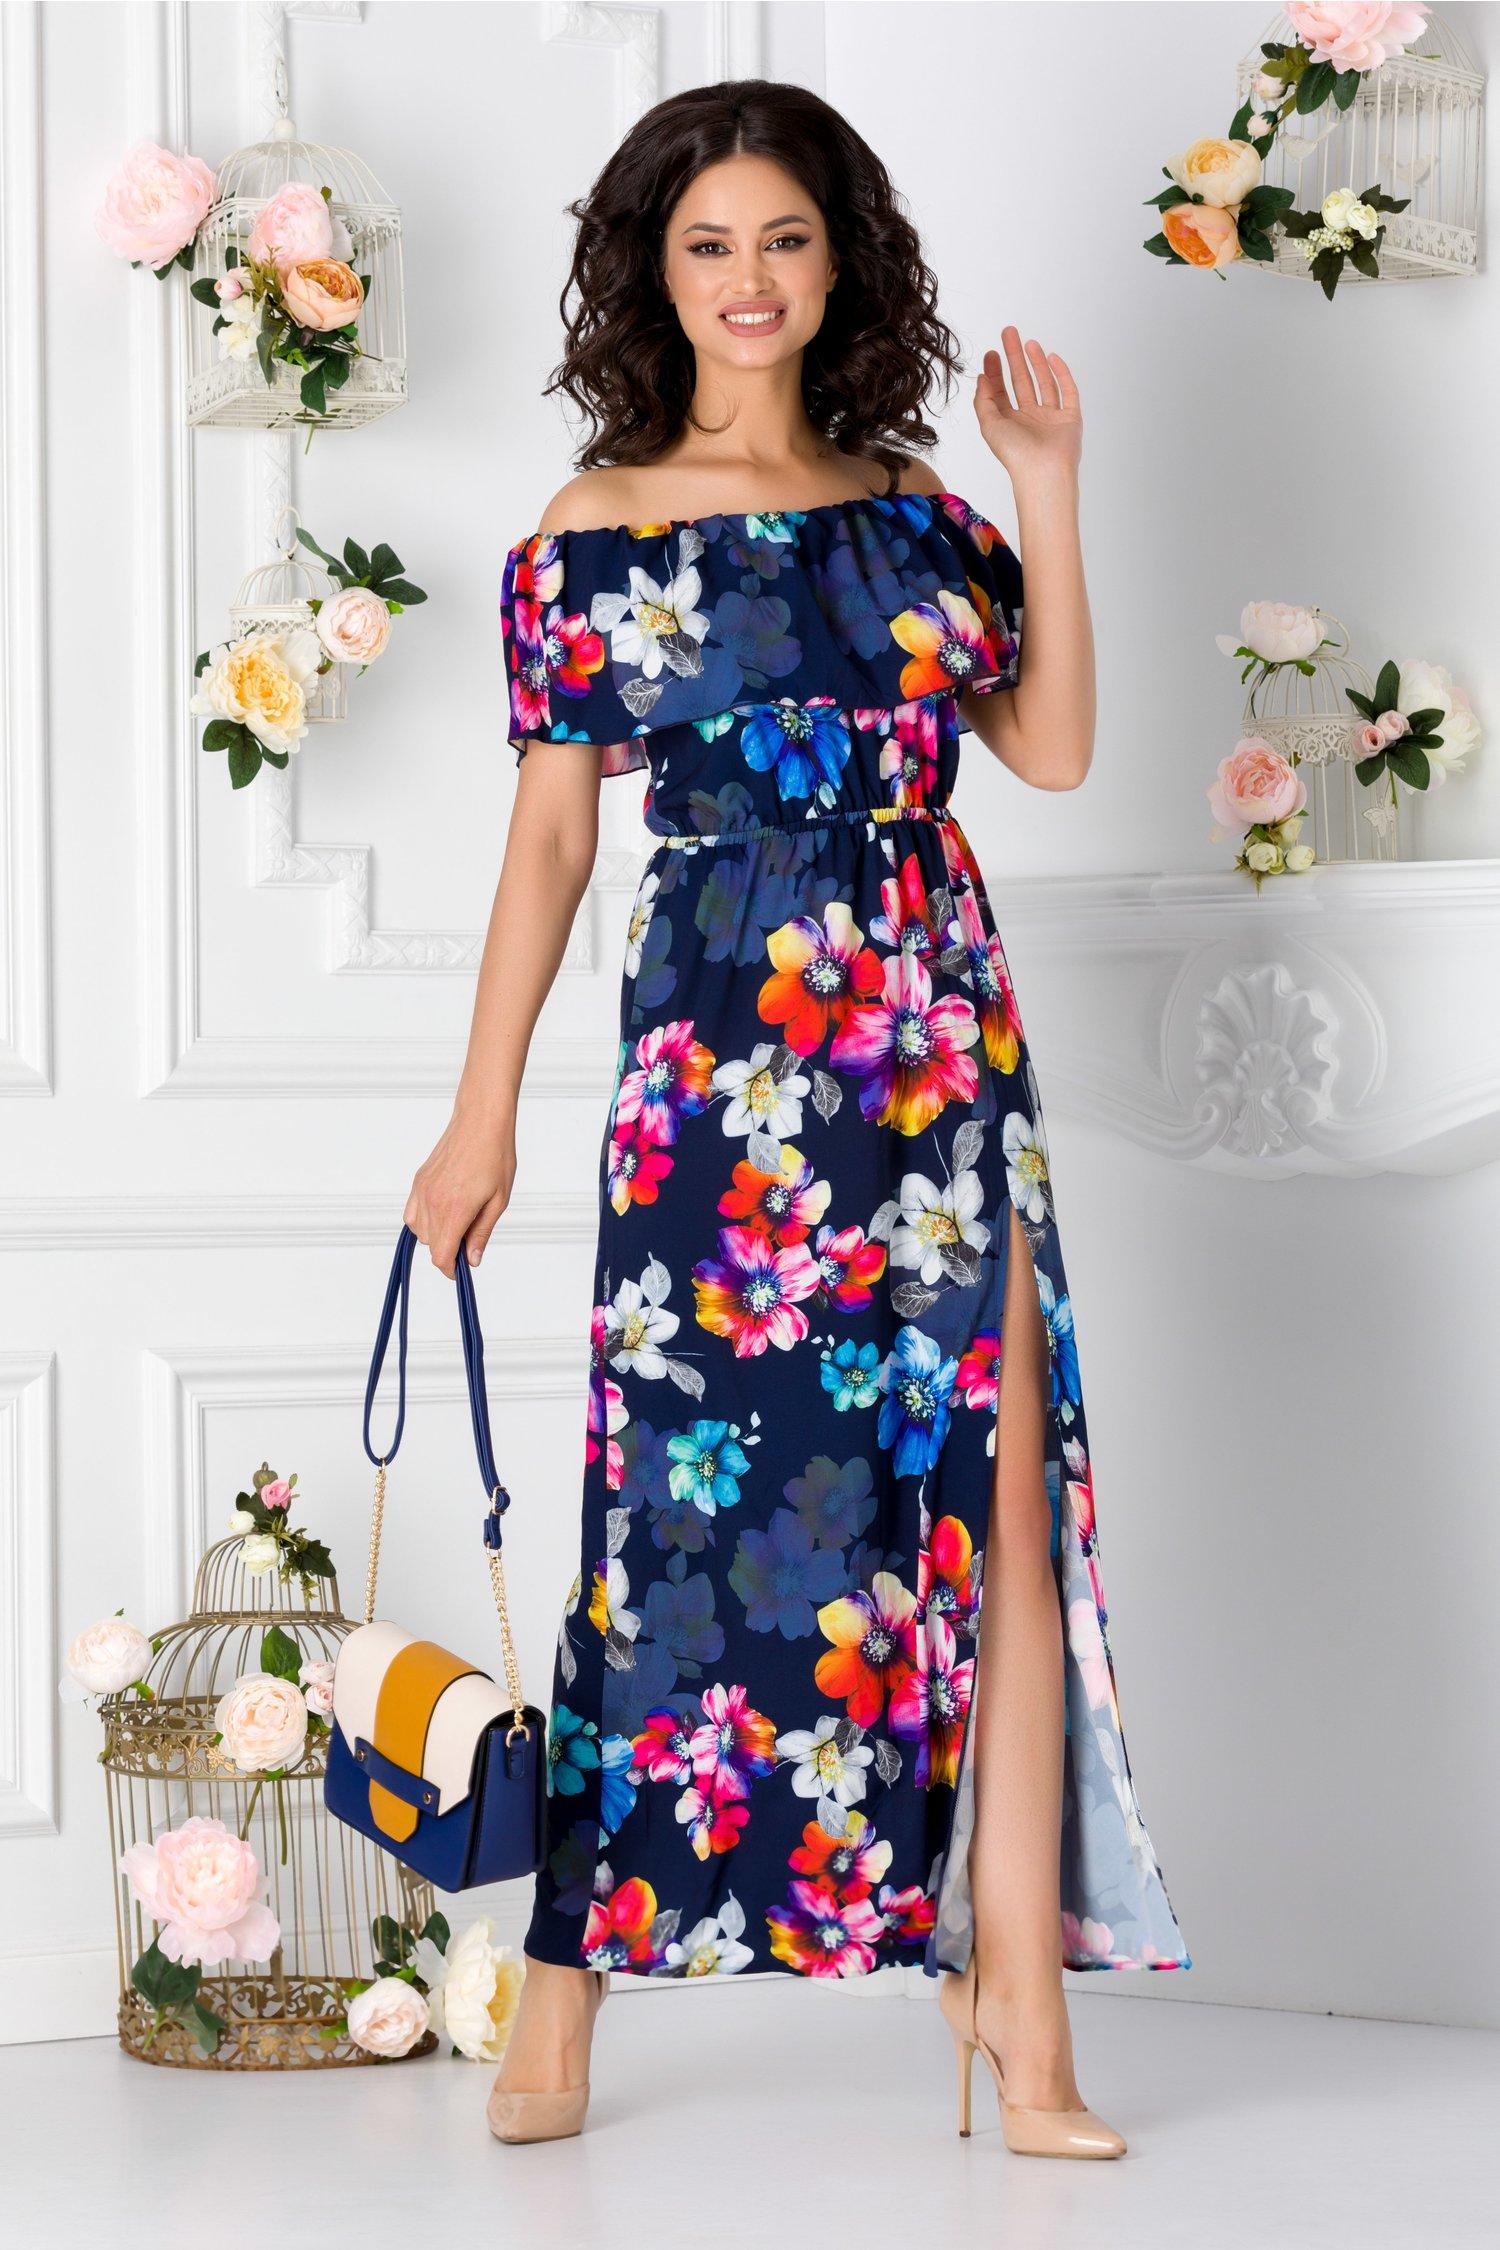 Rochie Samira Lunga Bleumarin Cu Imprimeu Floral